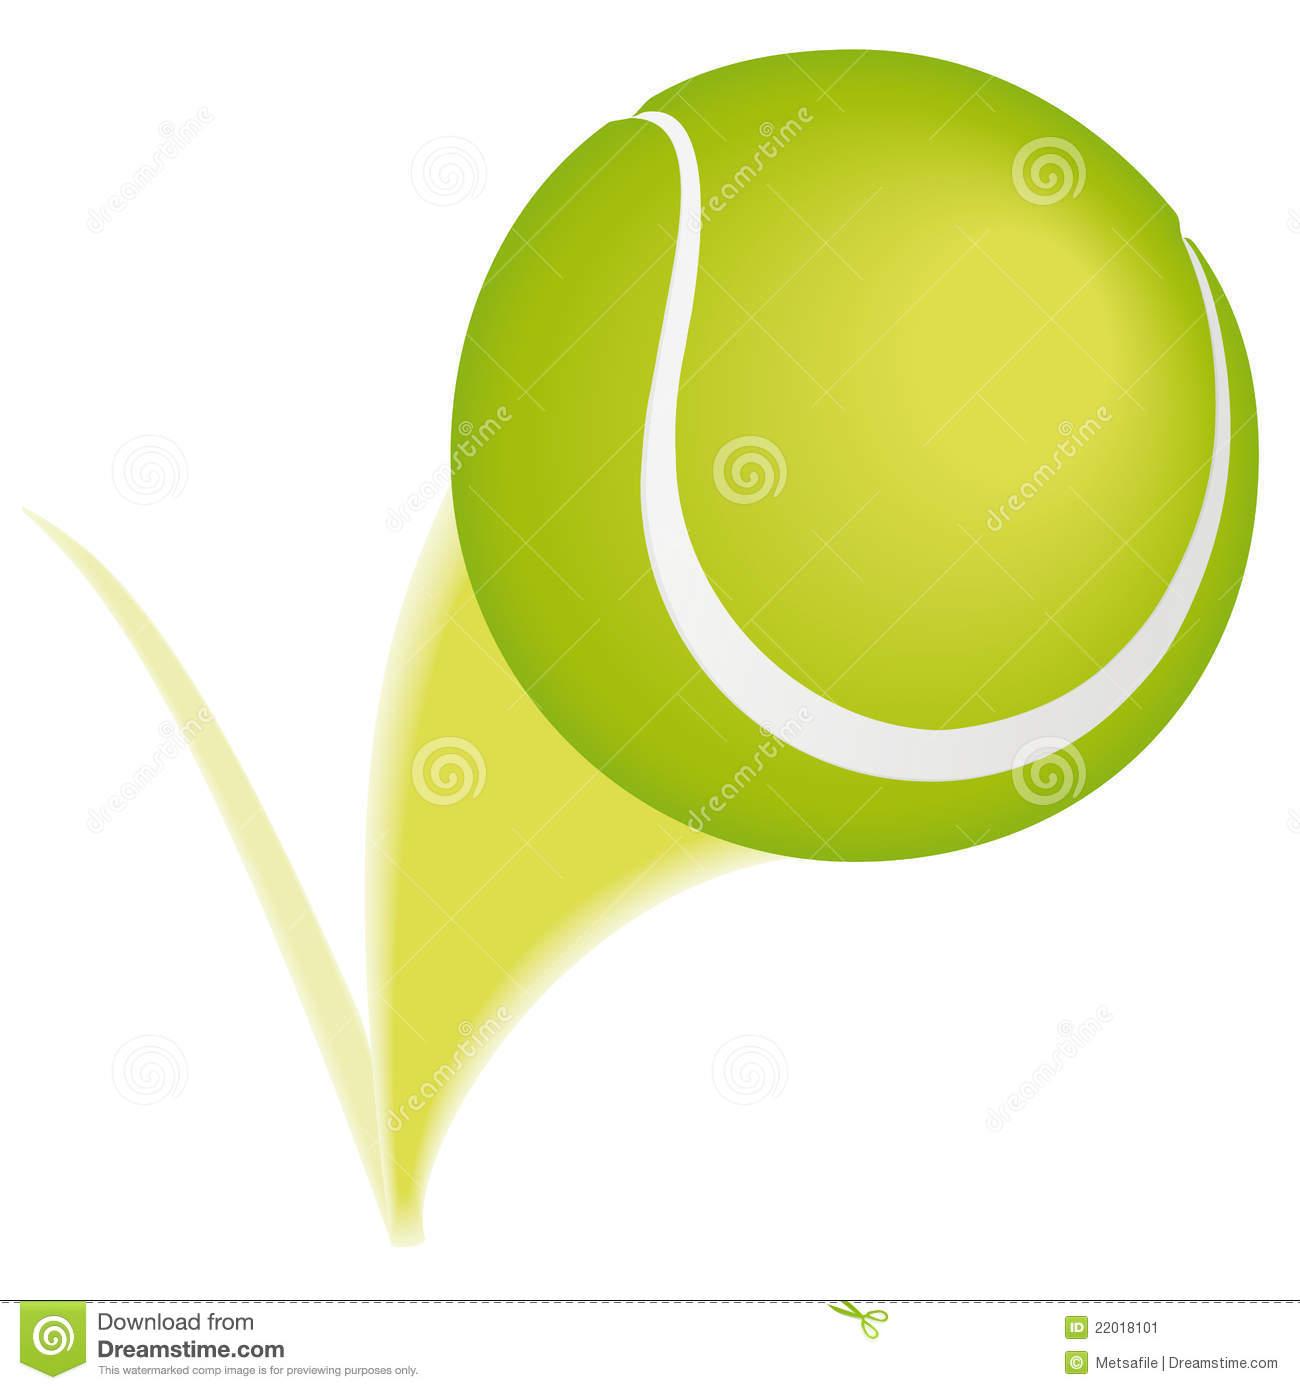 Balls clipart bouncy ball. Bouncing tennis panda free